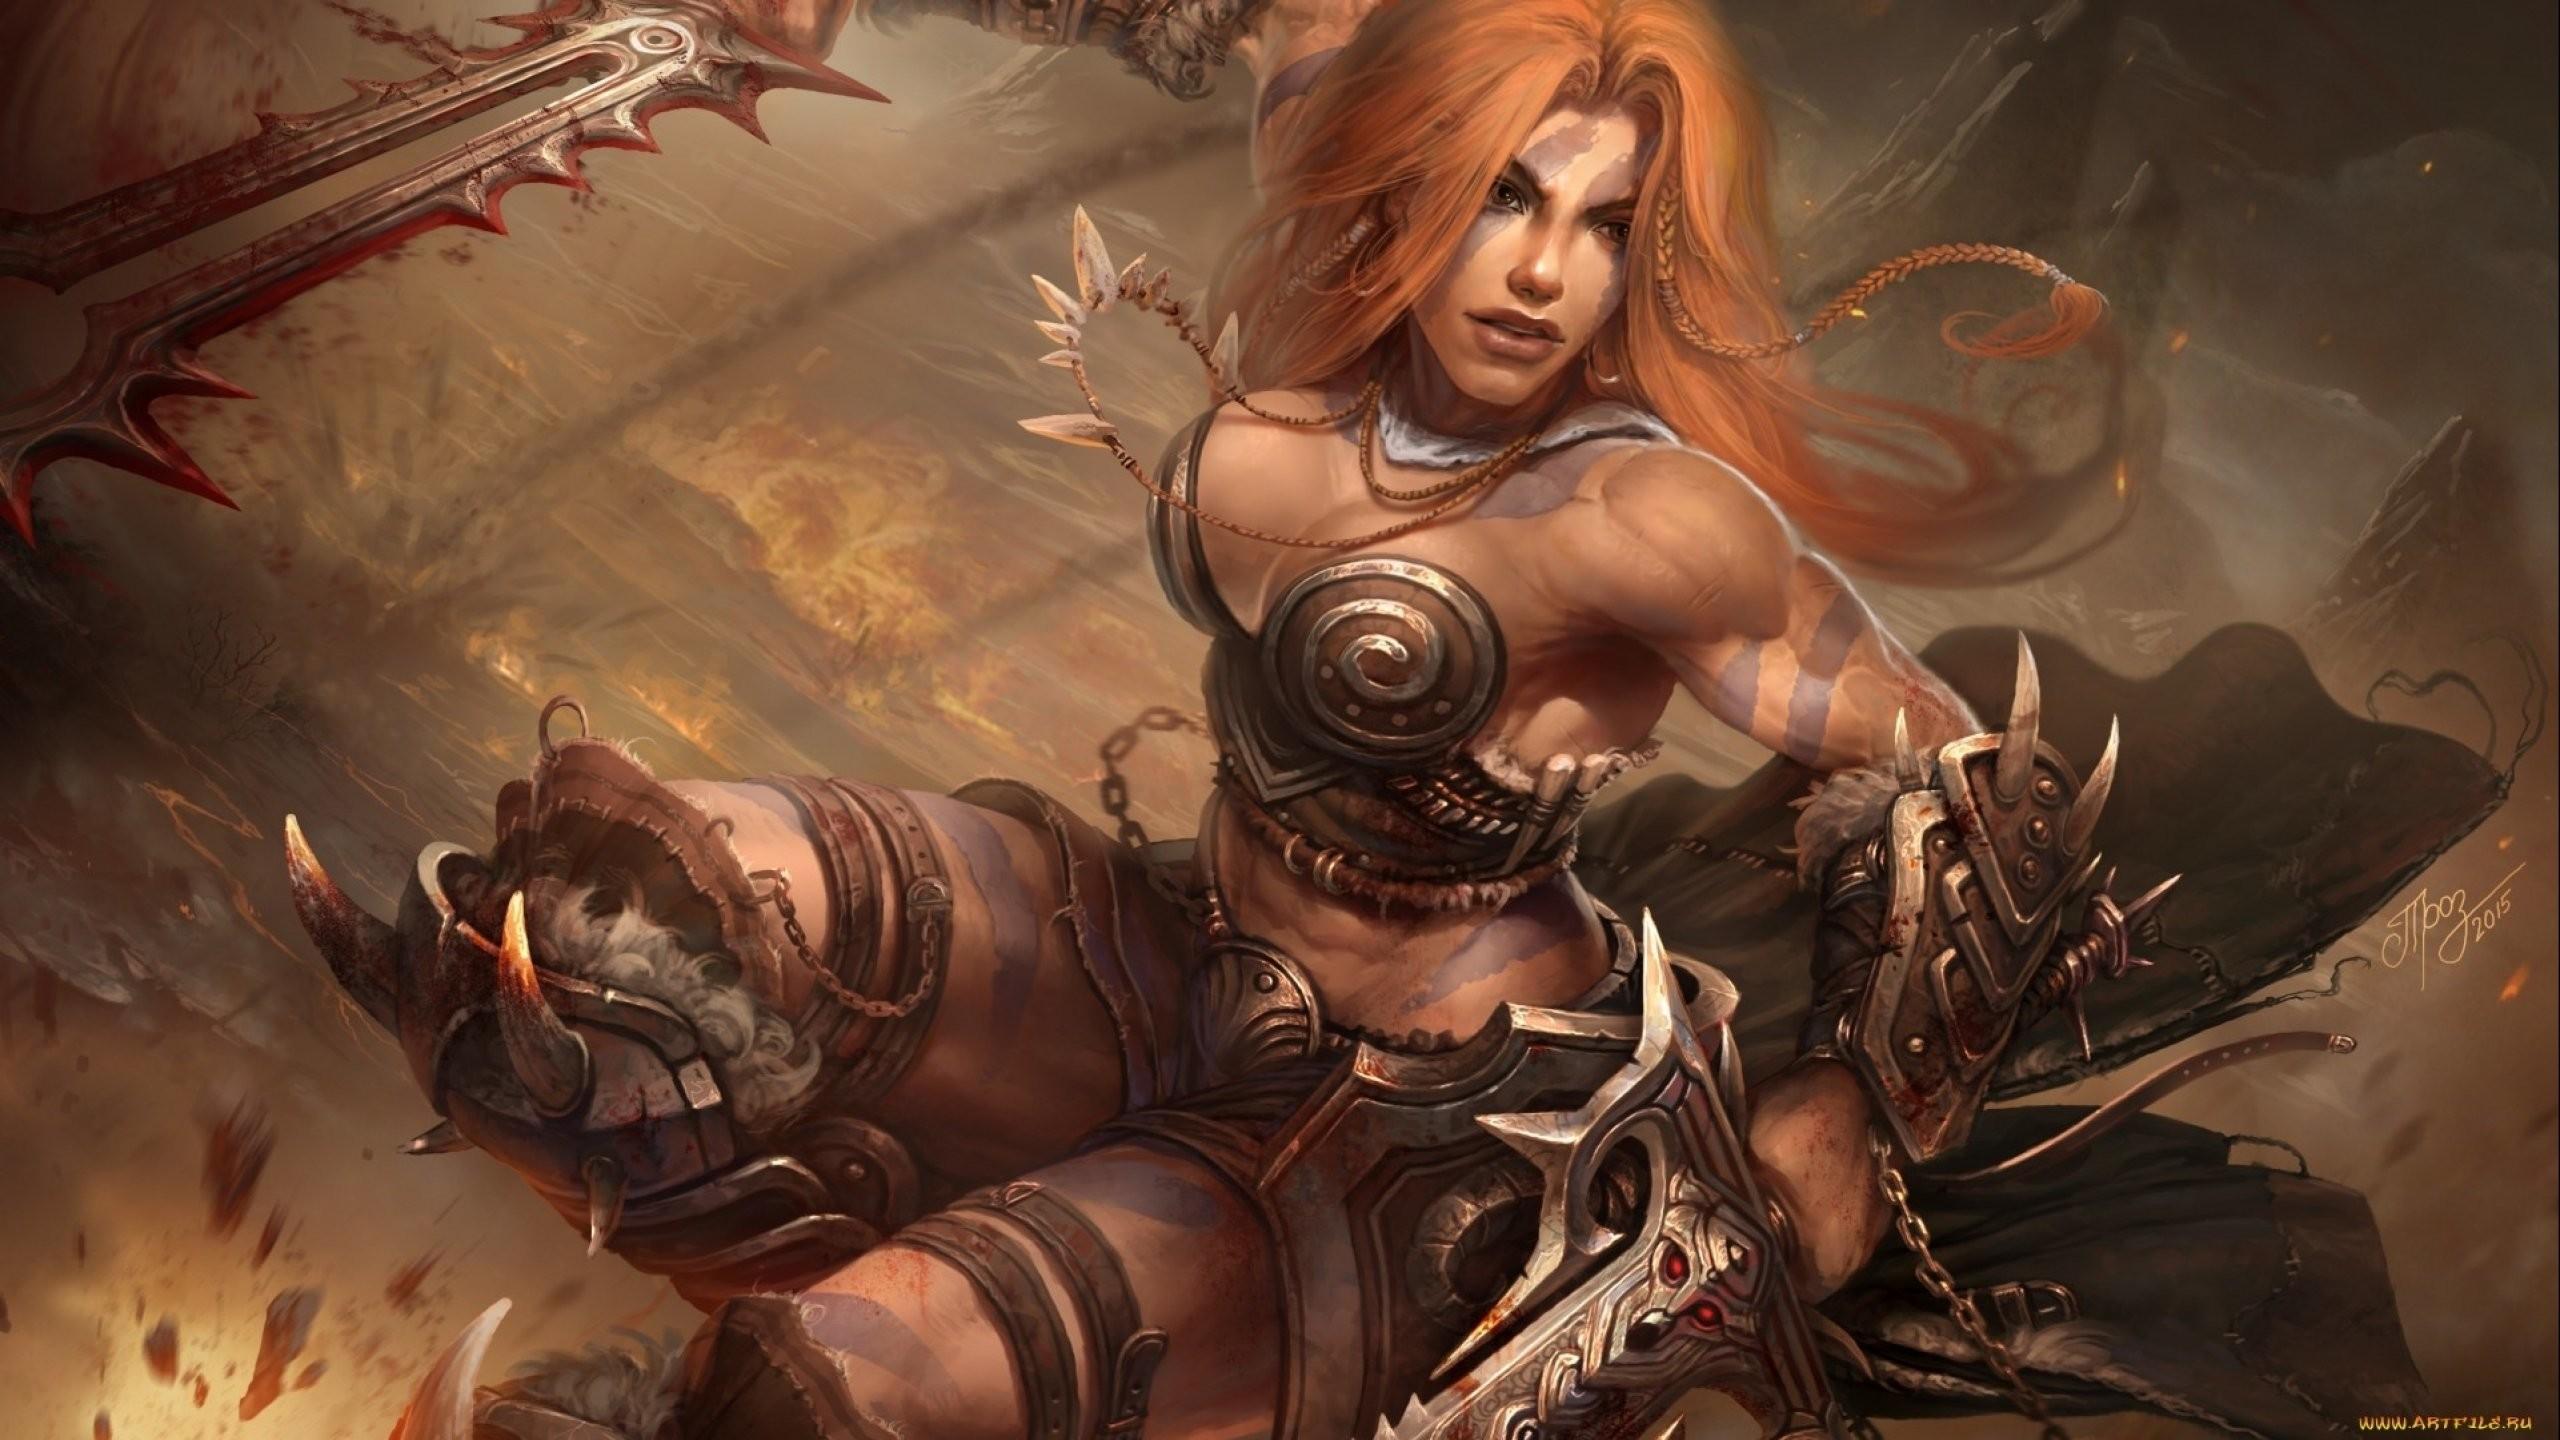 Fantasy artwork art warrior women woman female wallpaper      719463   WallpaperUP